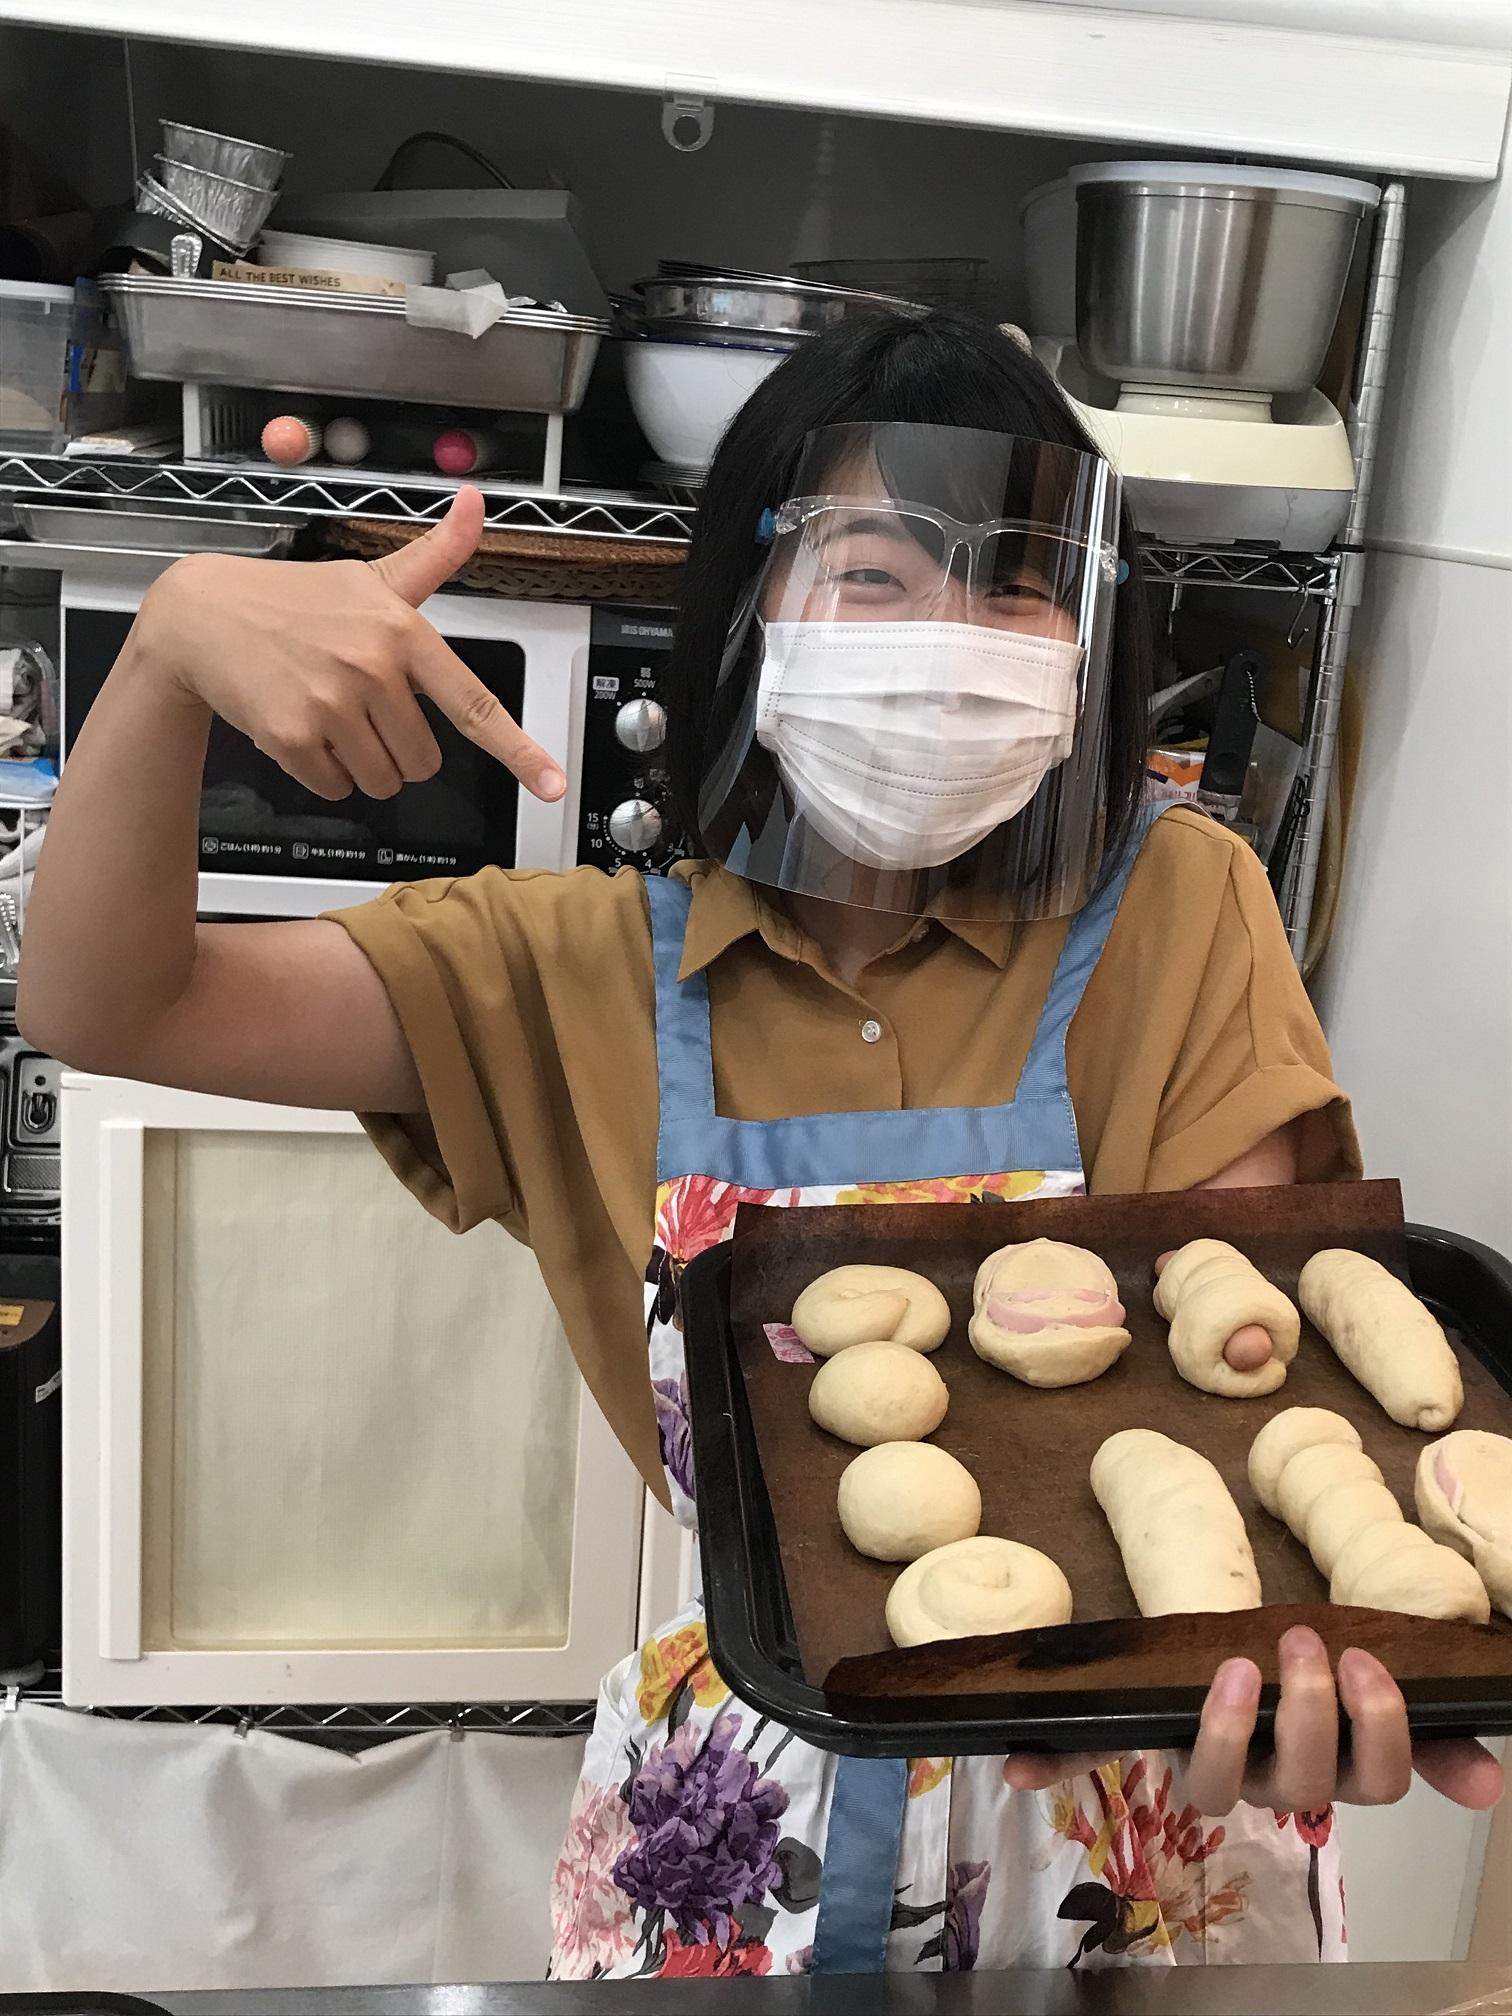 2021.09.23.a-ta-sante糖質制限パン料理教室。阿倍野区。桃ヶ池町。a-ta-sant'e.京都江部粉糖質制限パン体験会。ごきげん低糖質パン。低糖食コーディネーター。江部粉パンの第一人者。低糖質料理教室。利野郁枝。